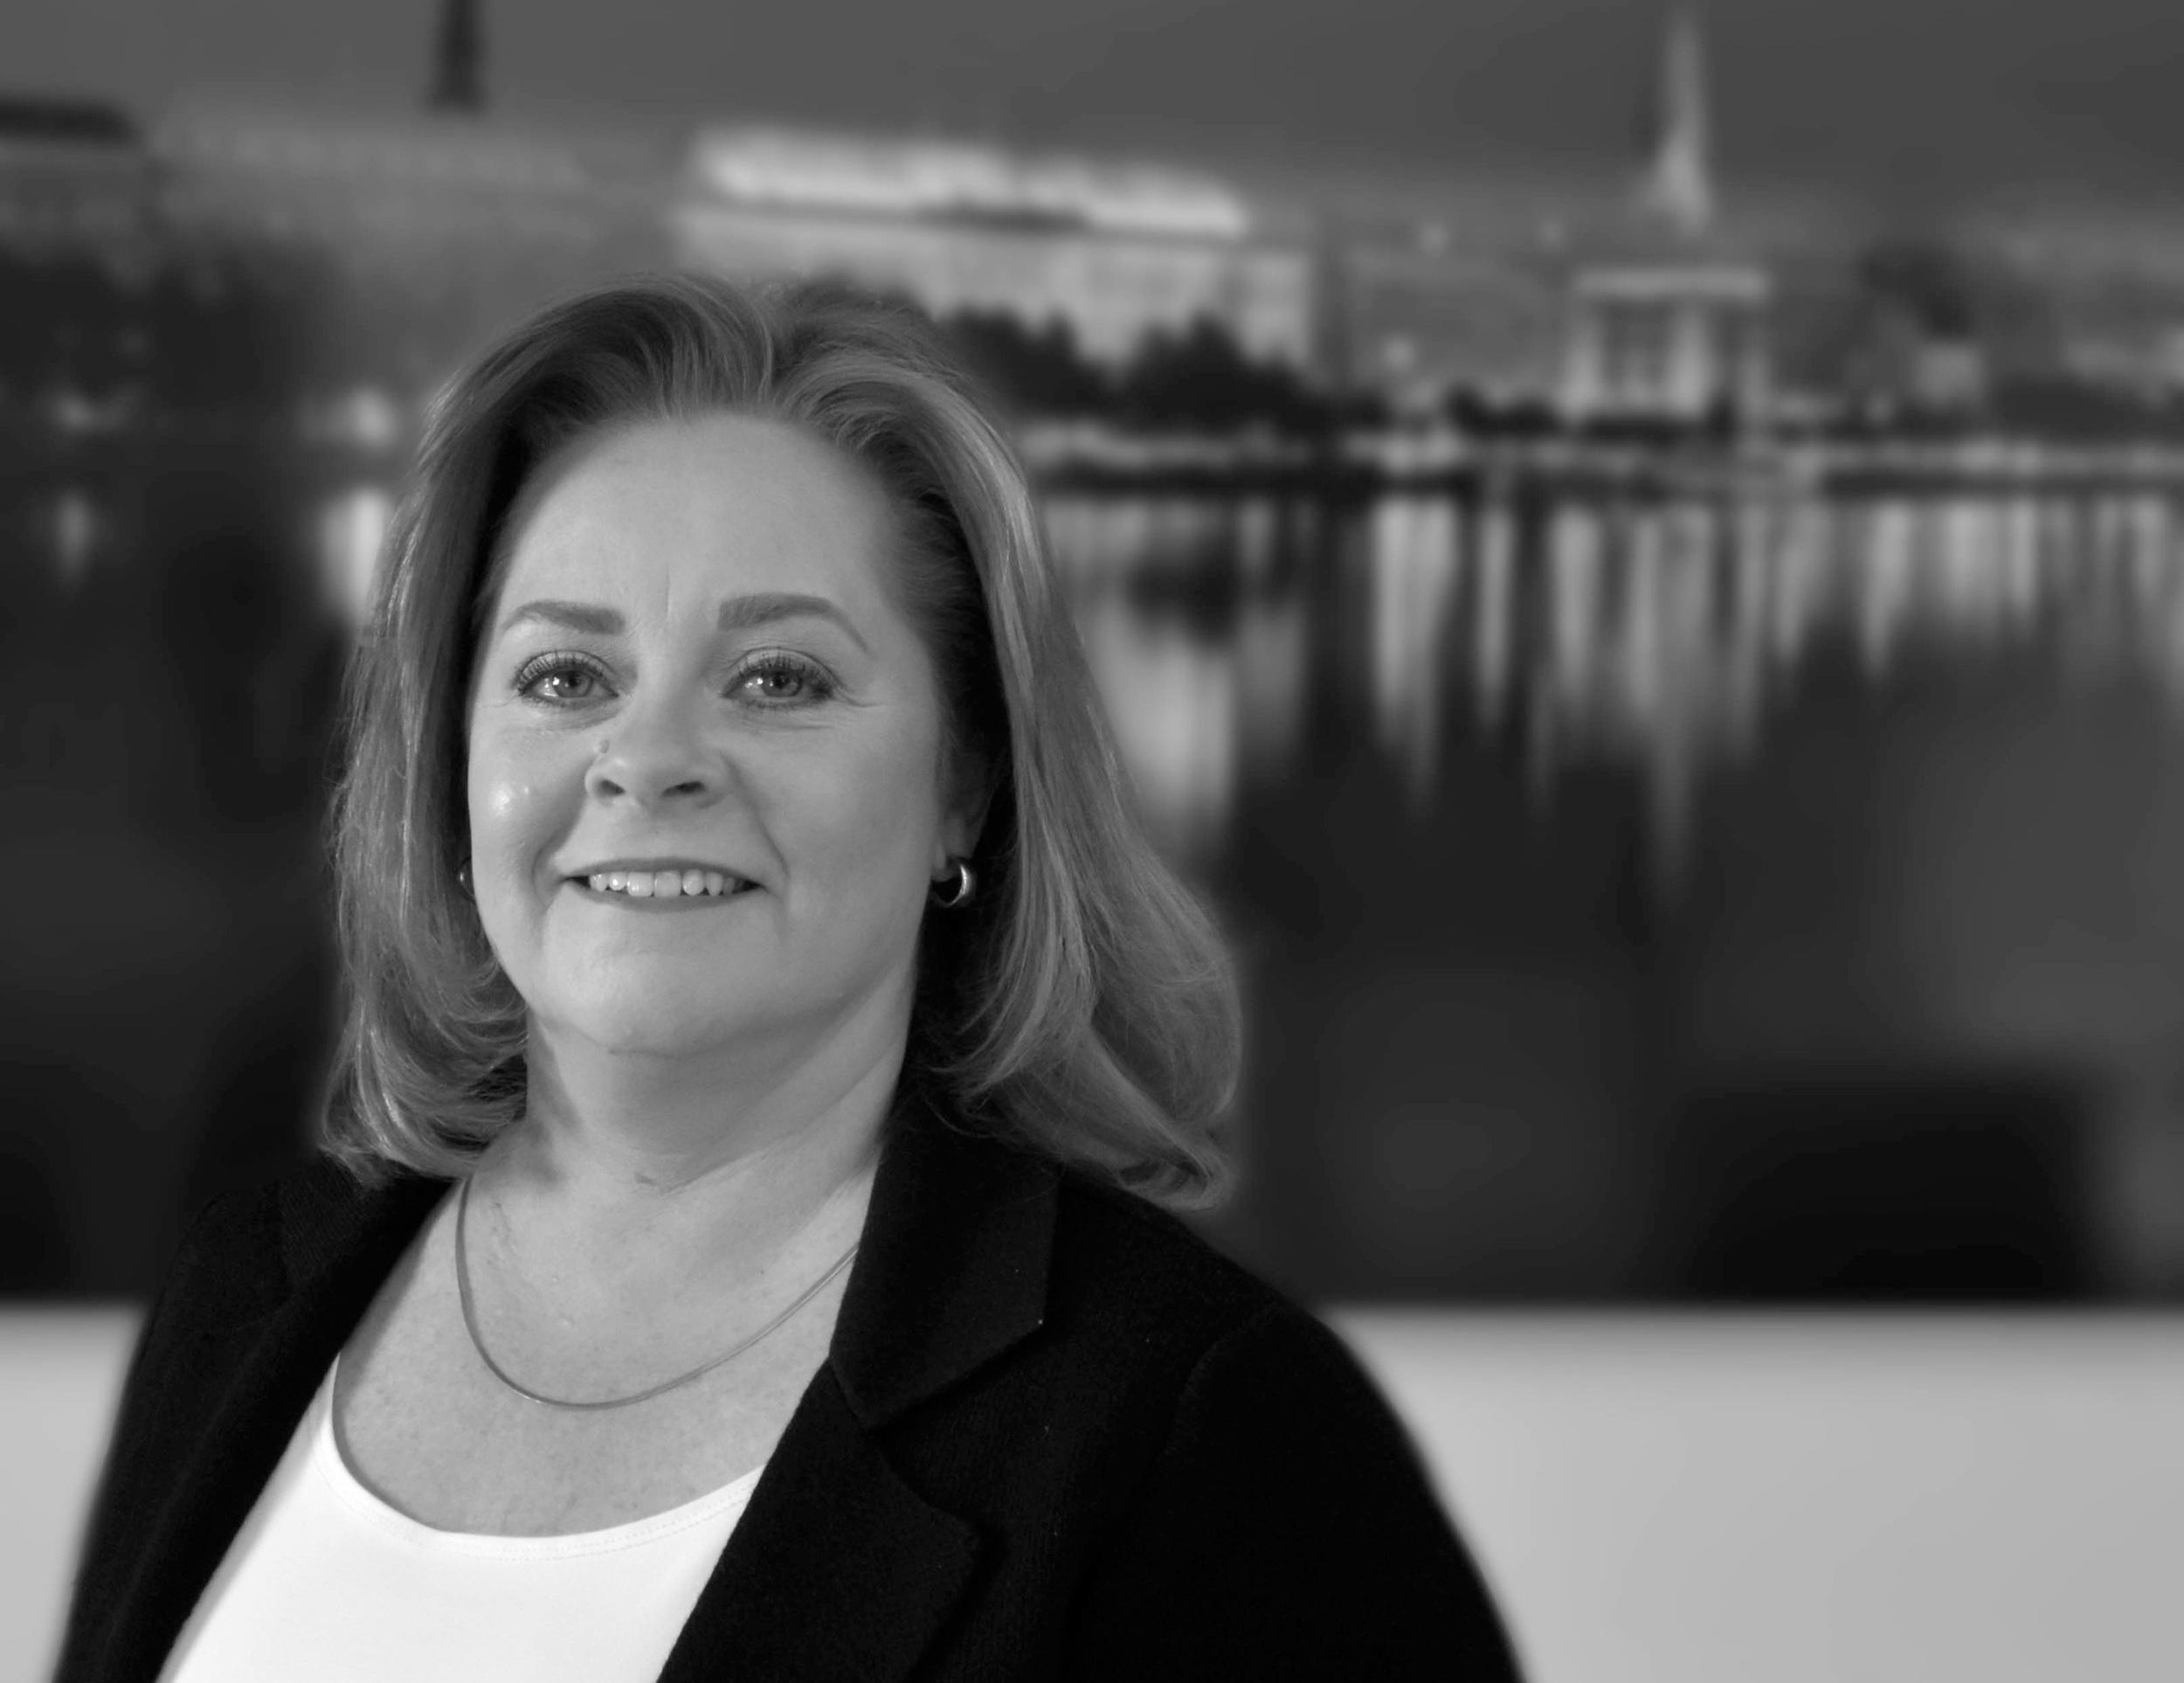 Kelly Johnson - Director of Human Resources and Organizational Effectivenesskjohnson@petercremerna.com